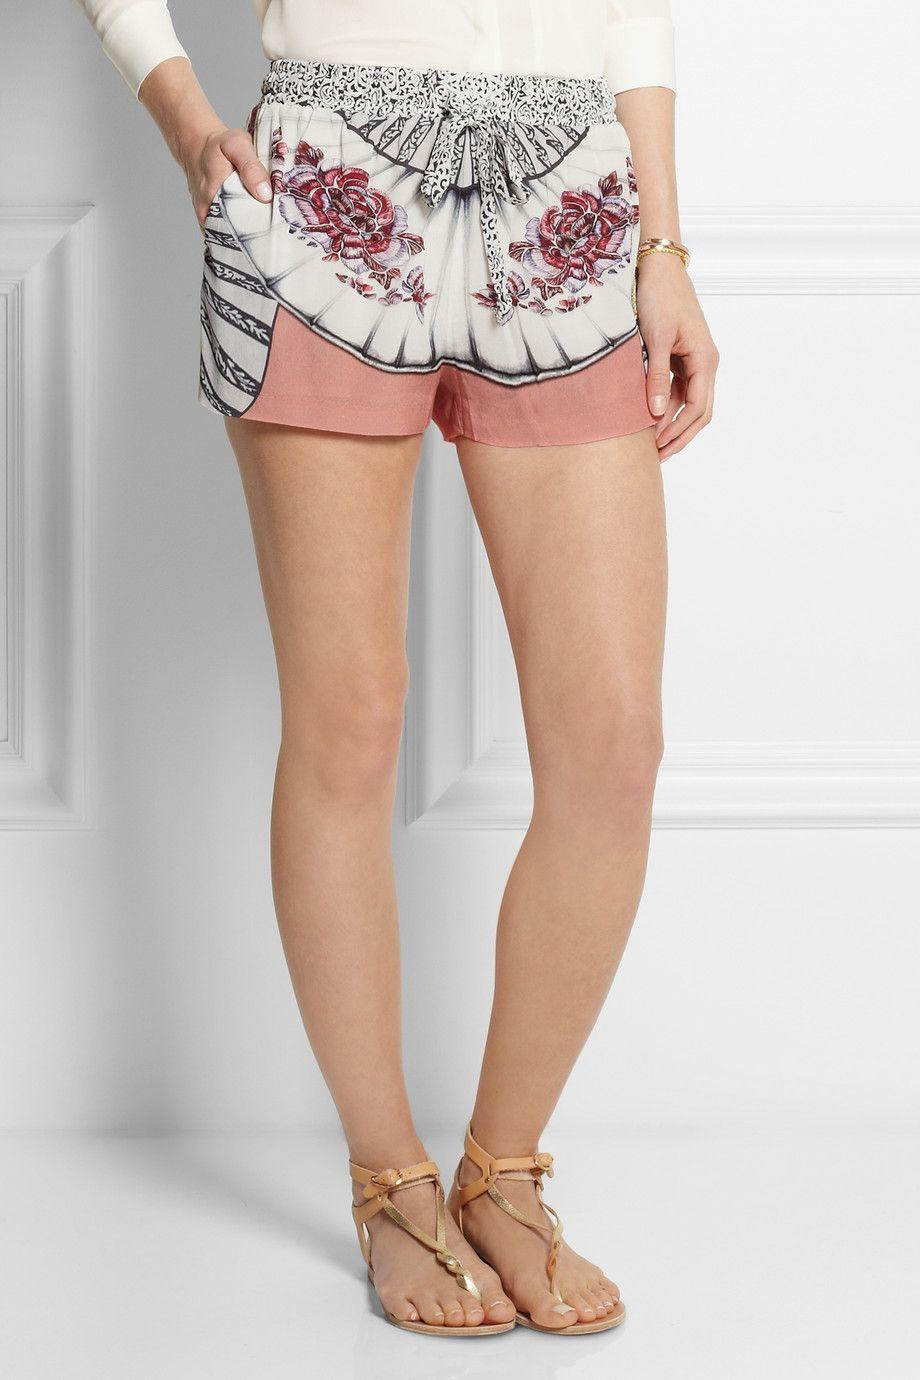 Paul & Joe|Portika printed crepe shorts|NET-A-PORTER.COM